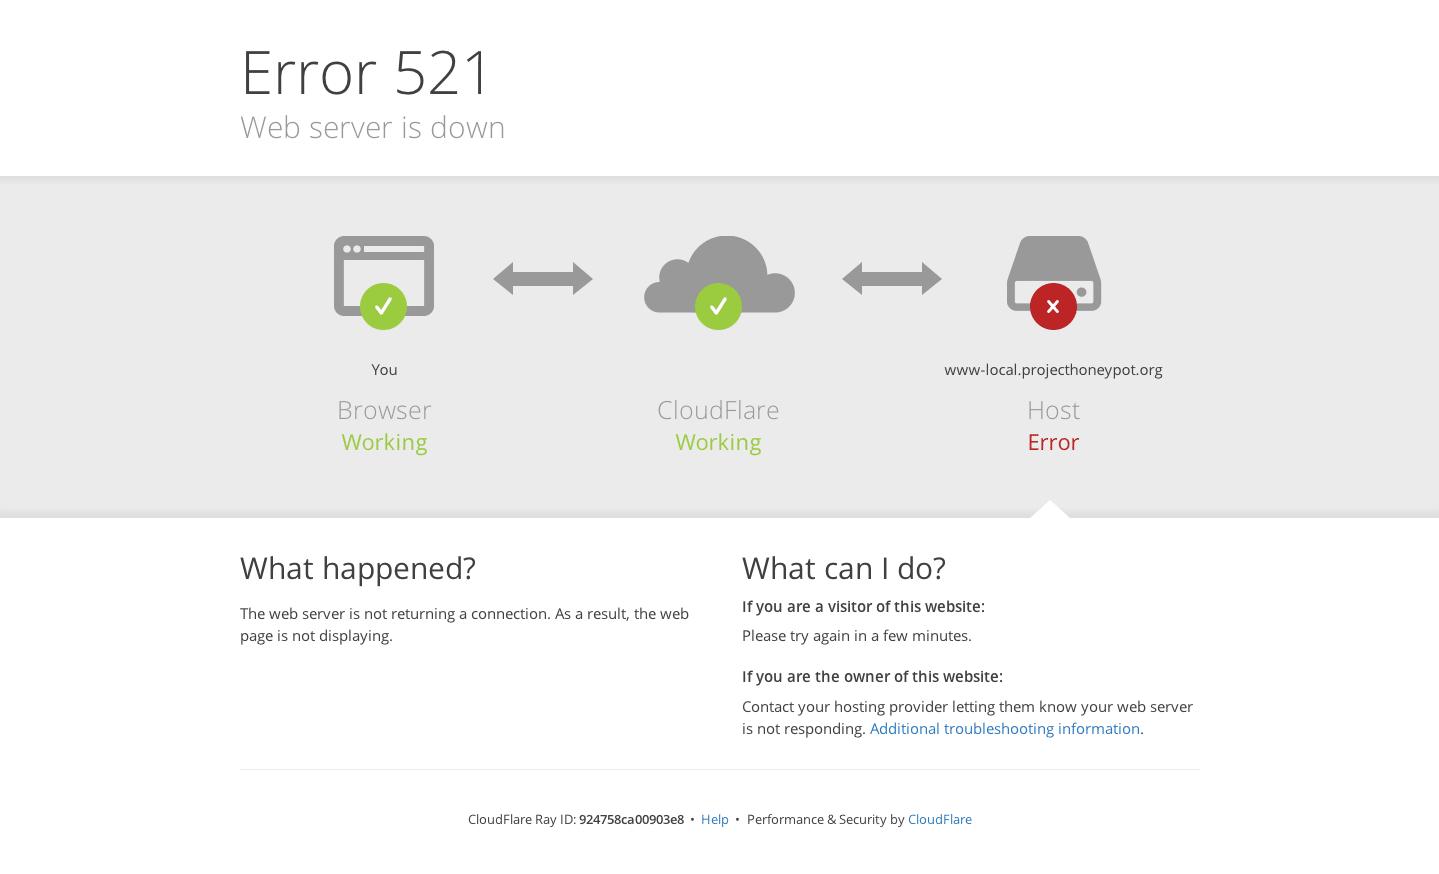 Et eksempel på Error 521-meddelelsen